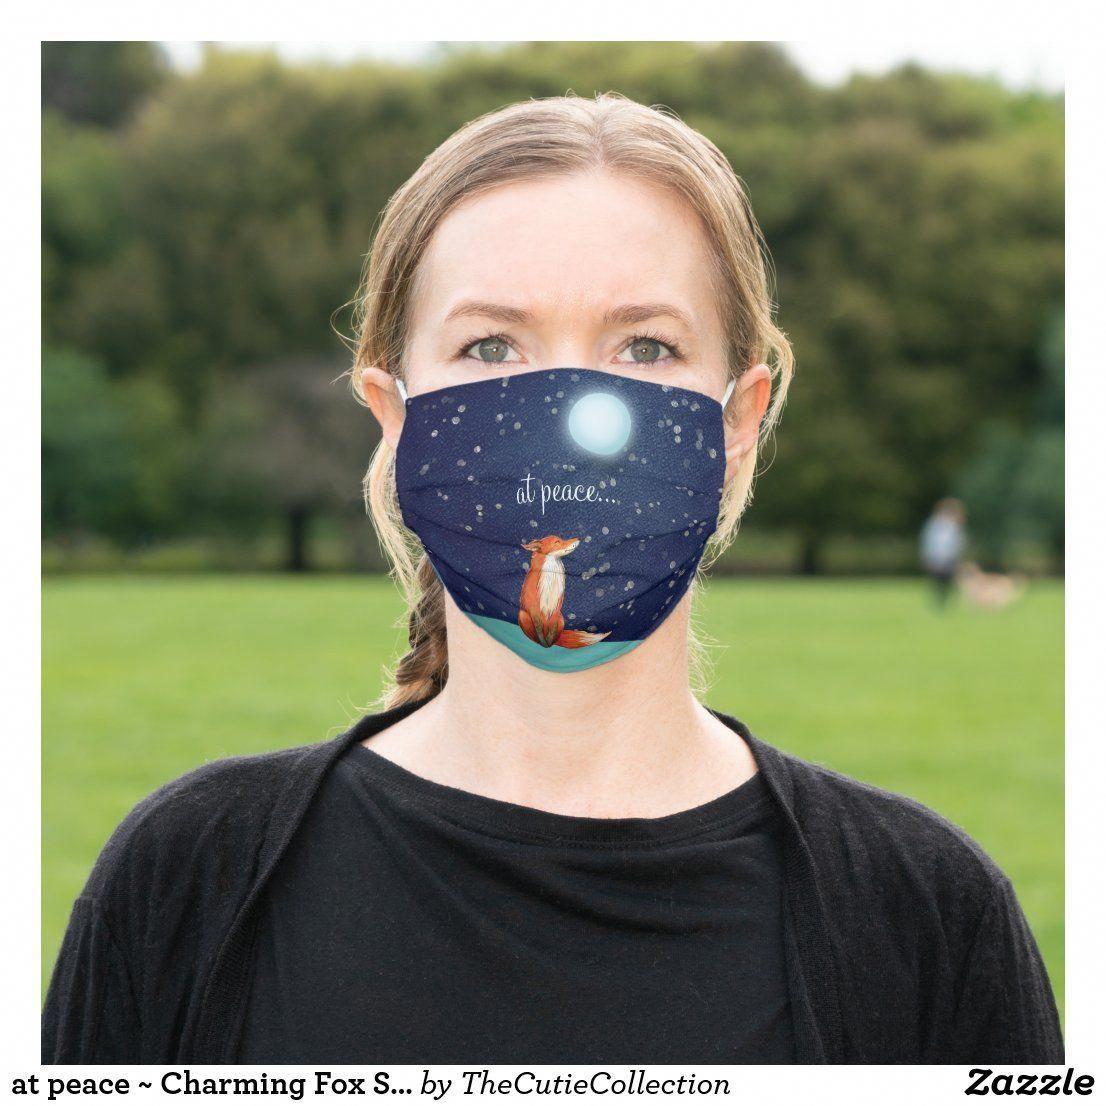 n95 face mask gray in 2020 Face mask, Diy face mask, Mask